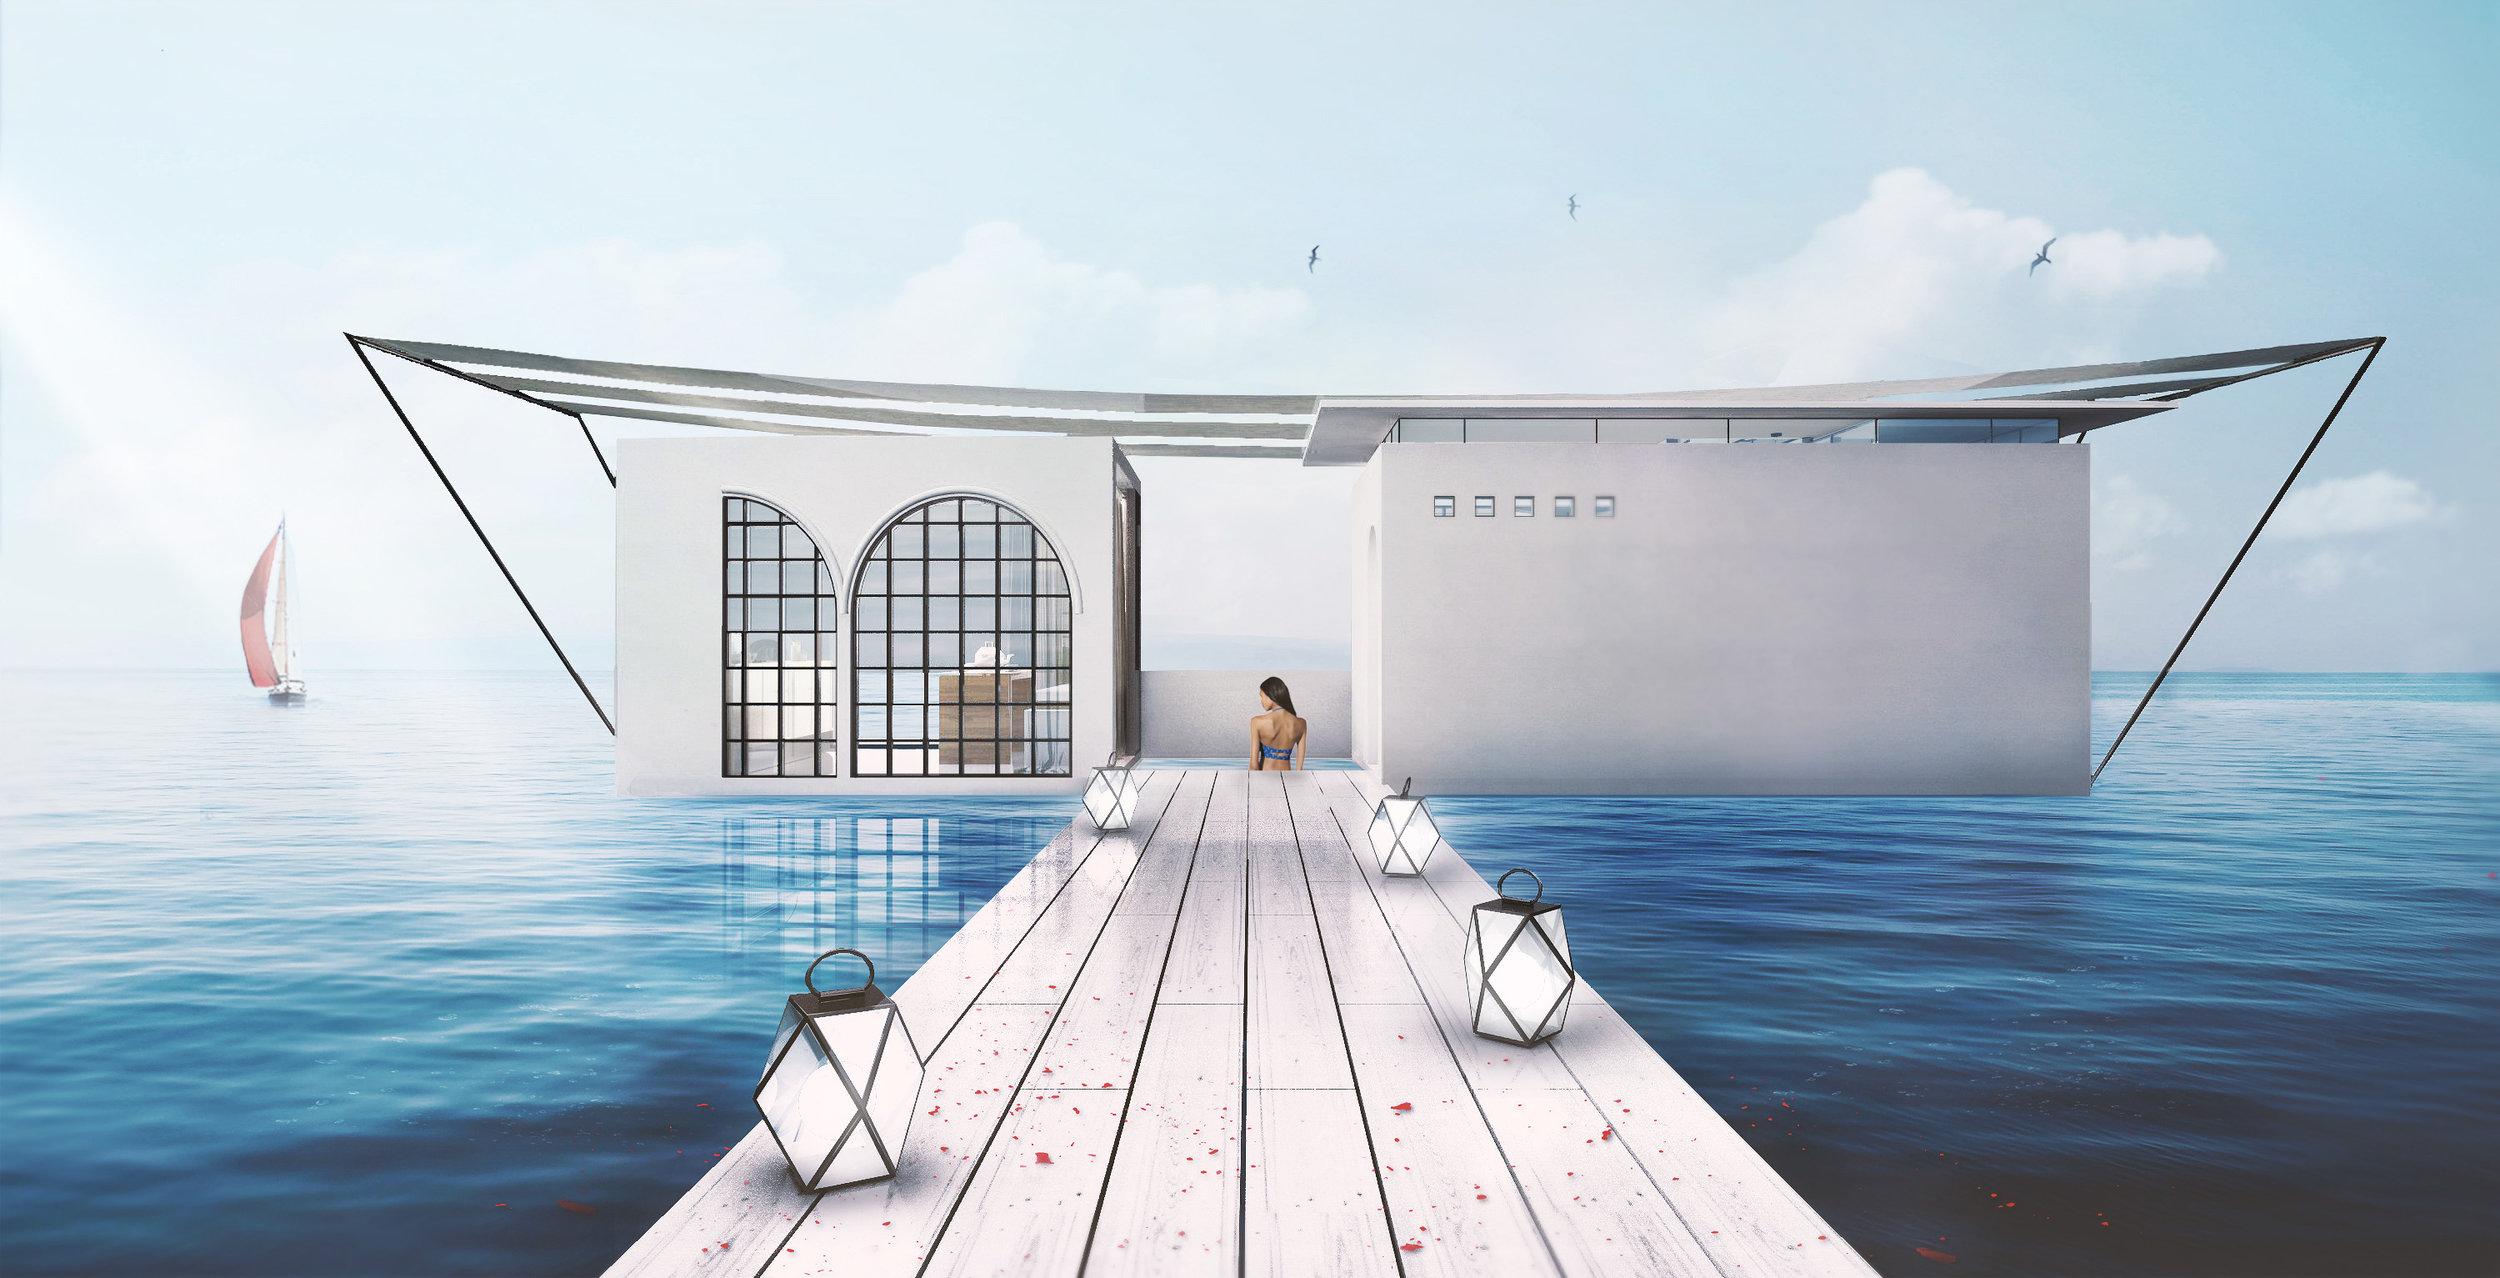 Bre_Gila_Shemie_Zakay_Floating_Room_Competition (2).jpg